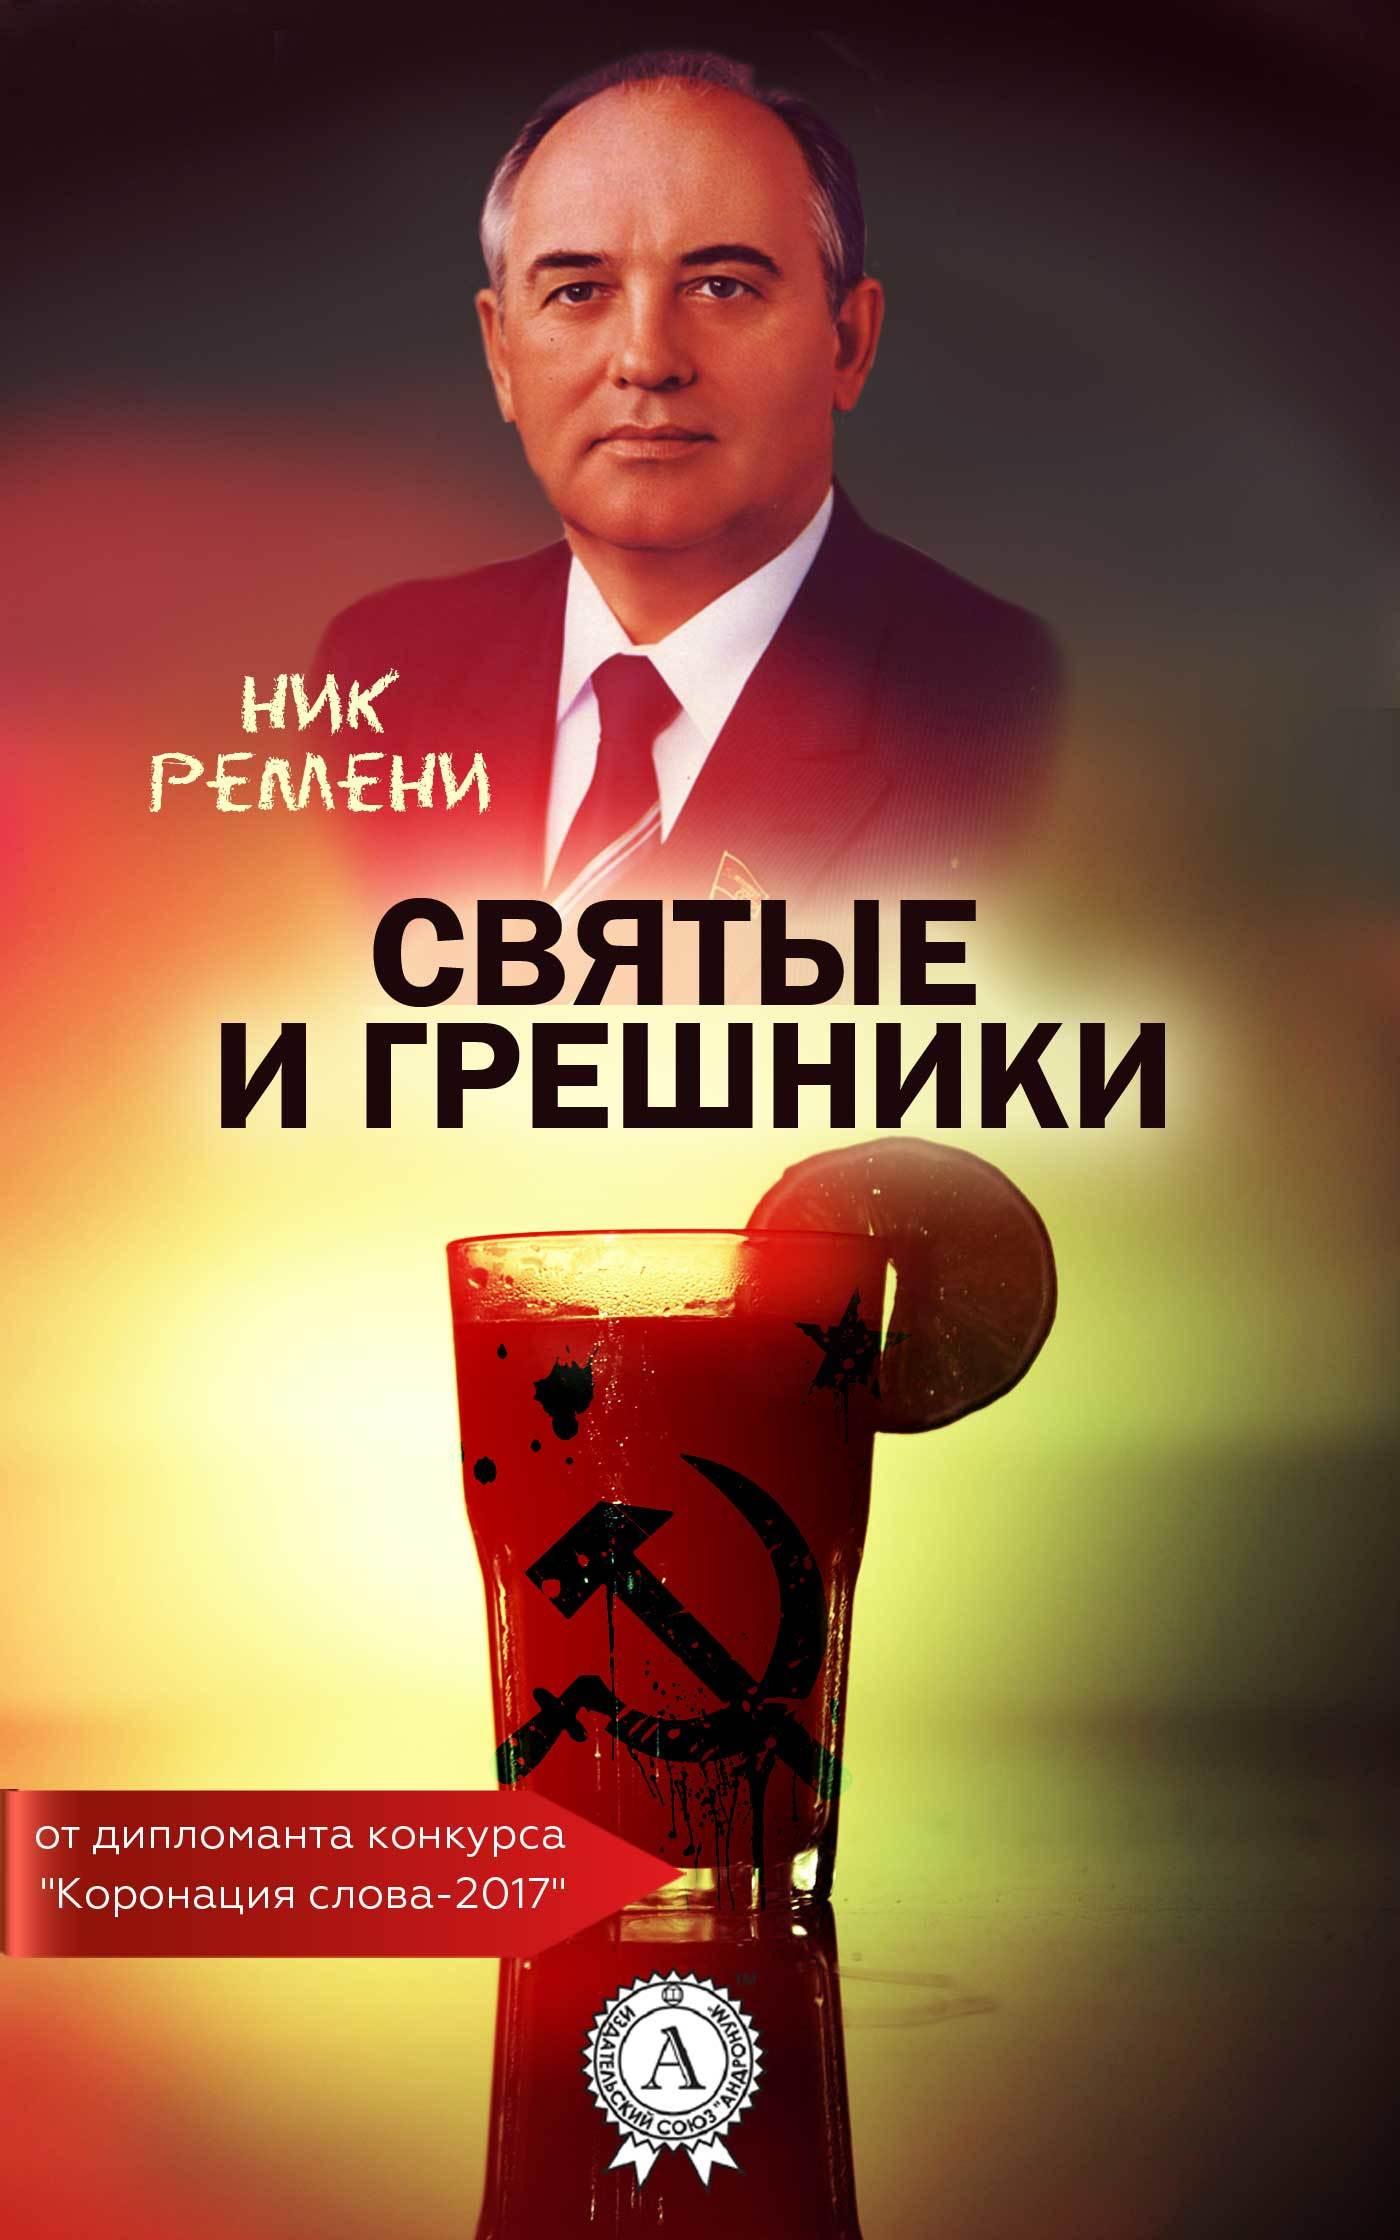 Ник Ремени бесплатно